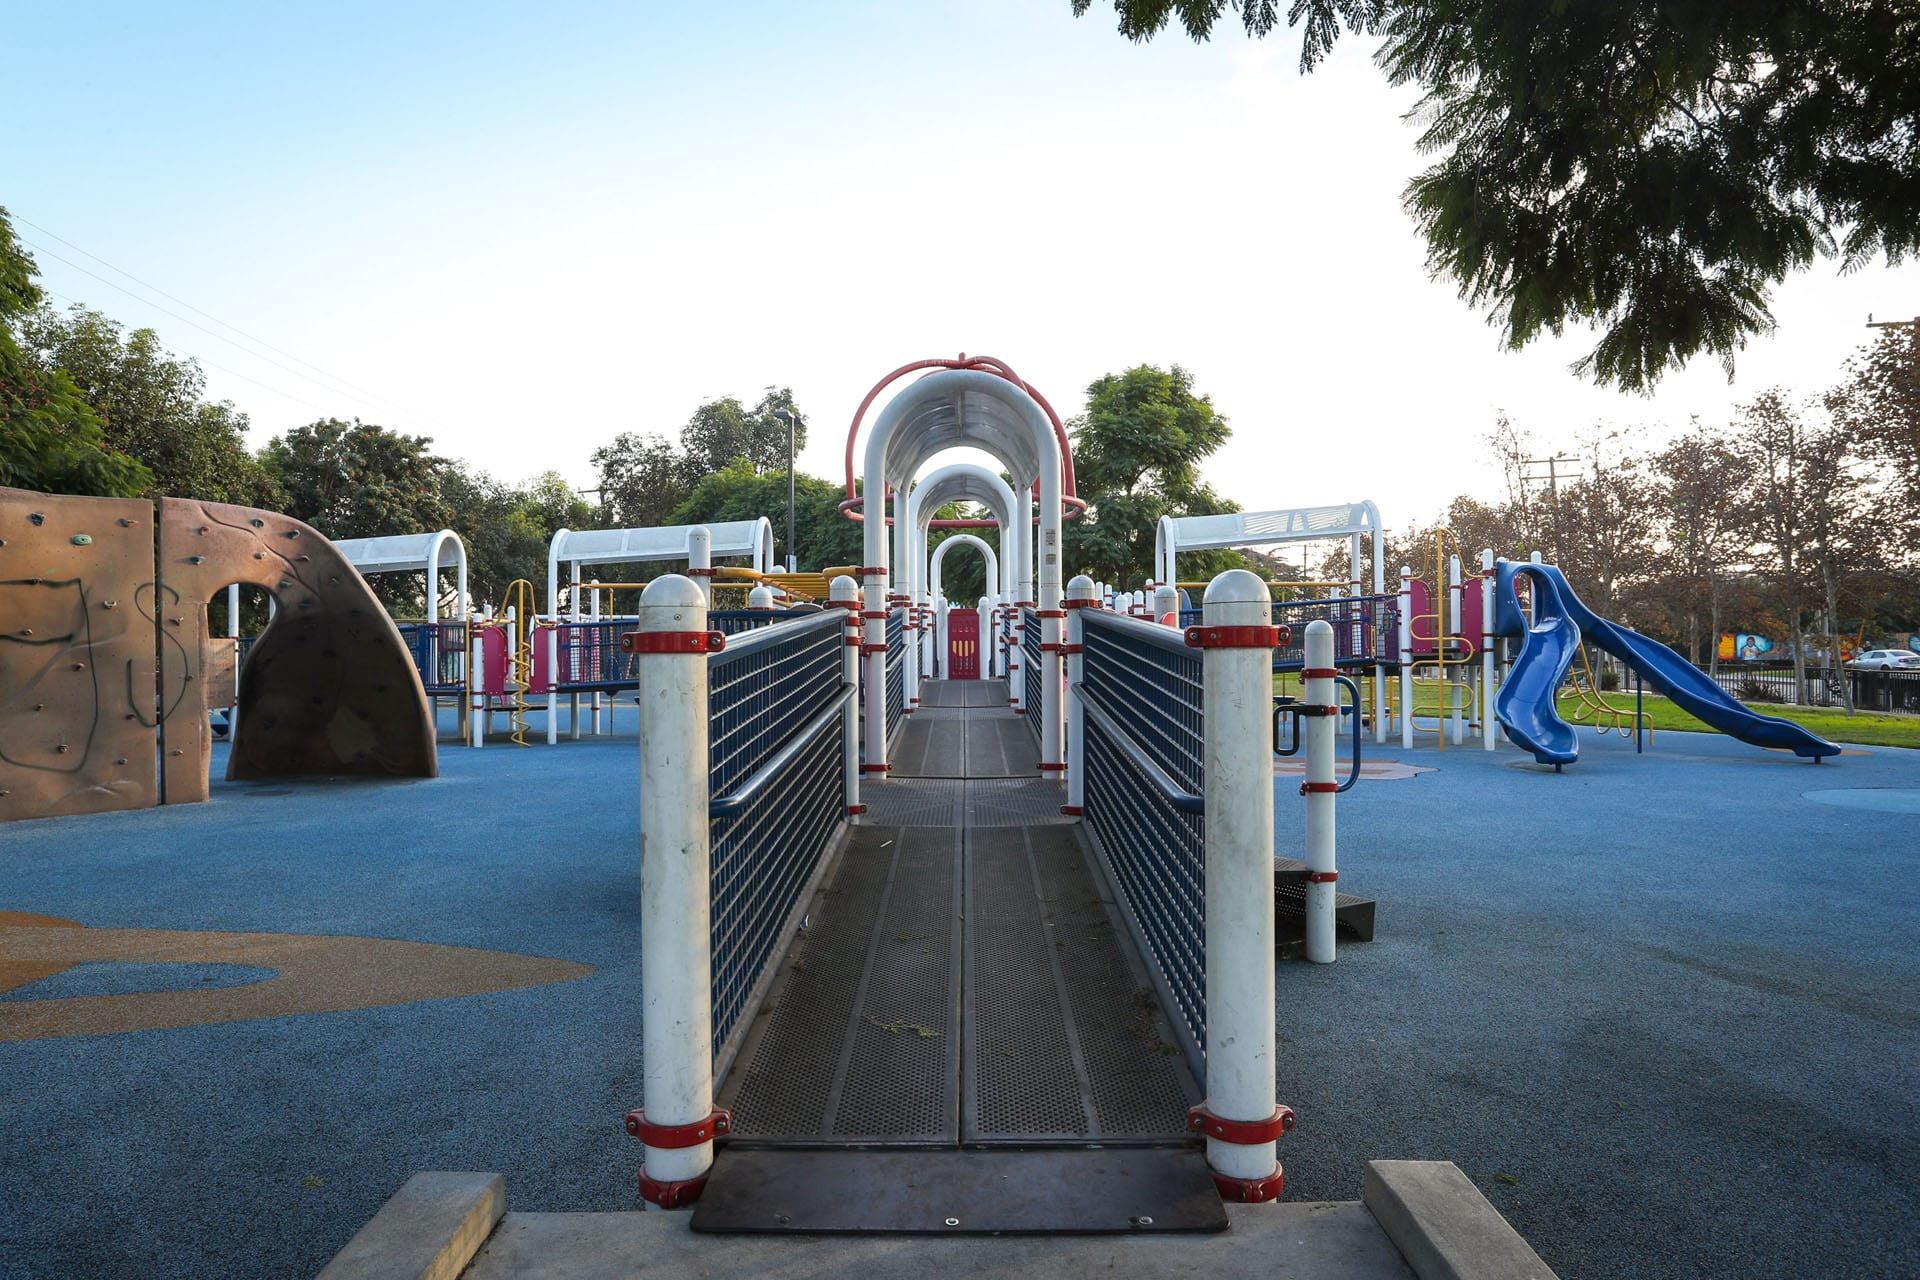 Bridge into a jungle gym structure